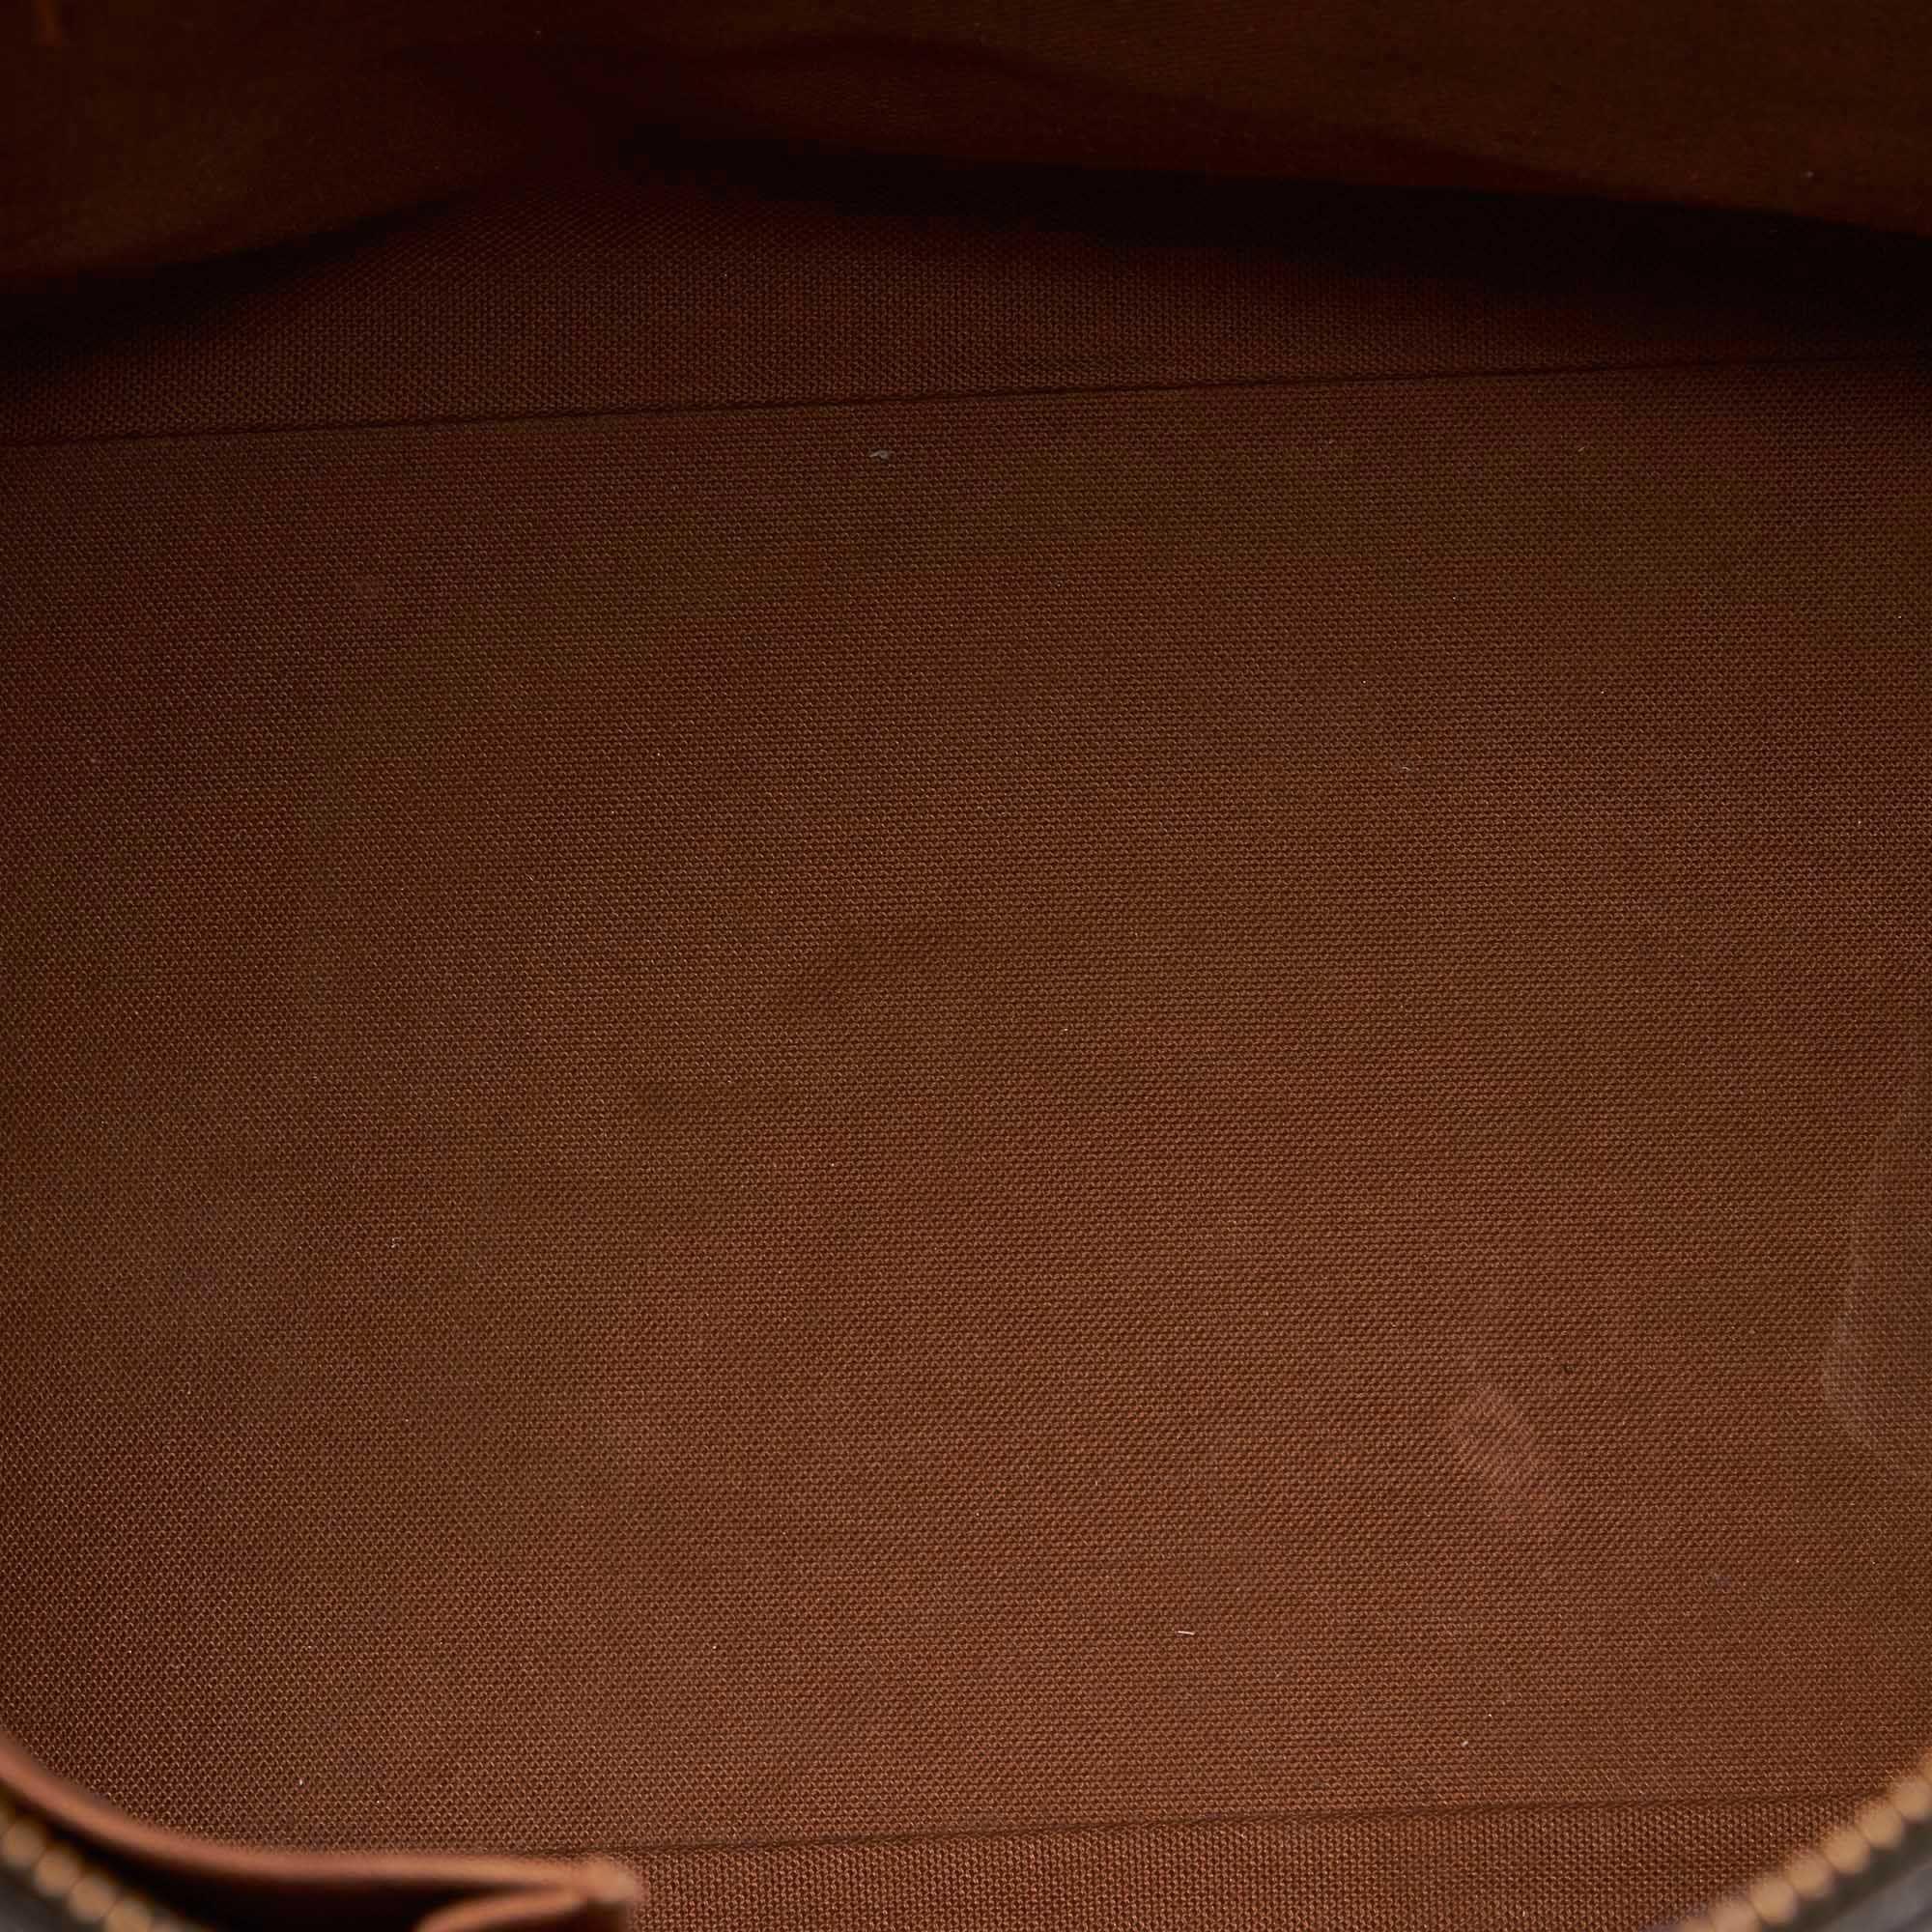 Vintage Louis Vuitton Monogram Cabas Mezzo Brown